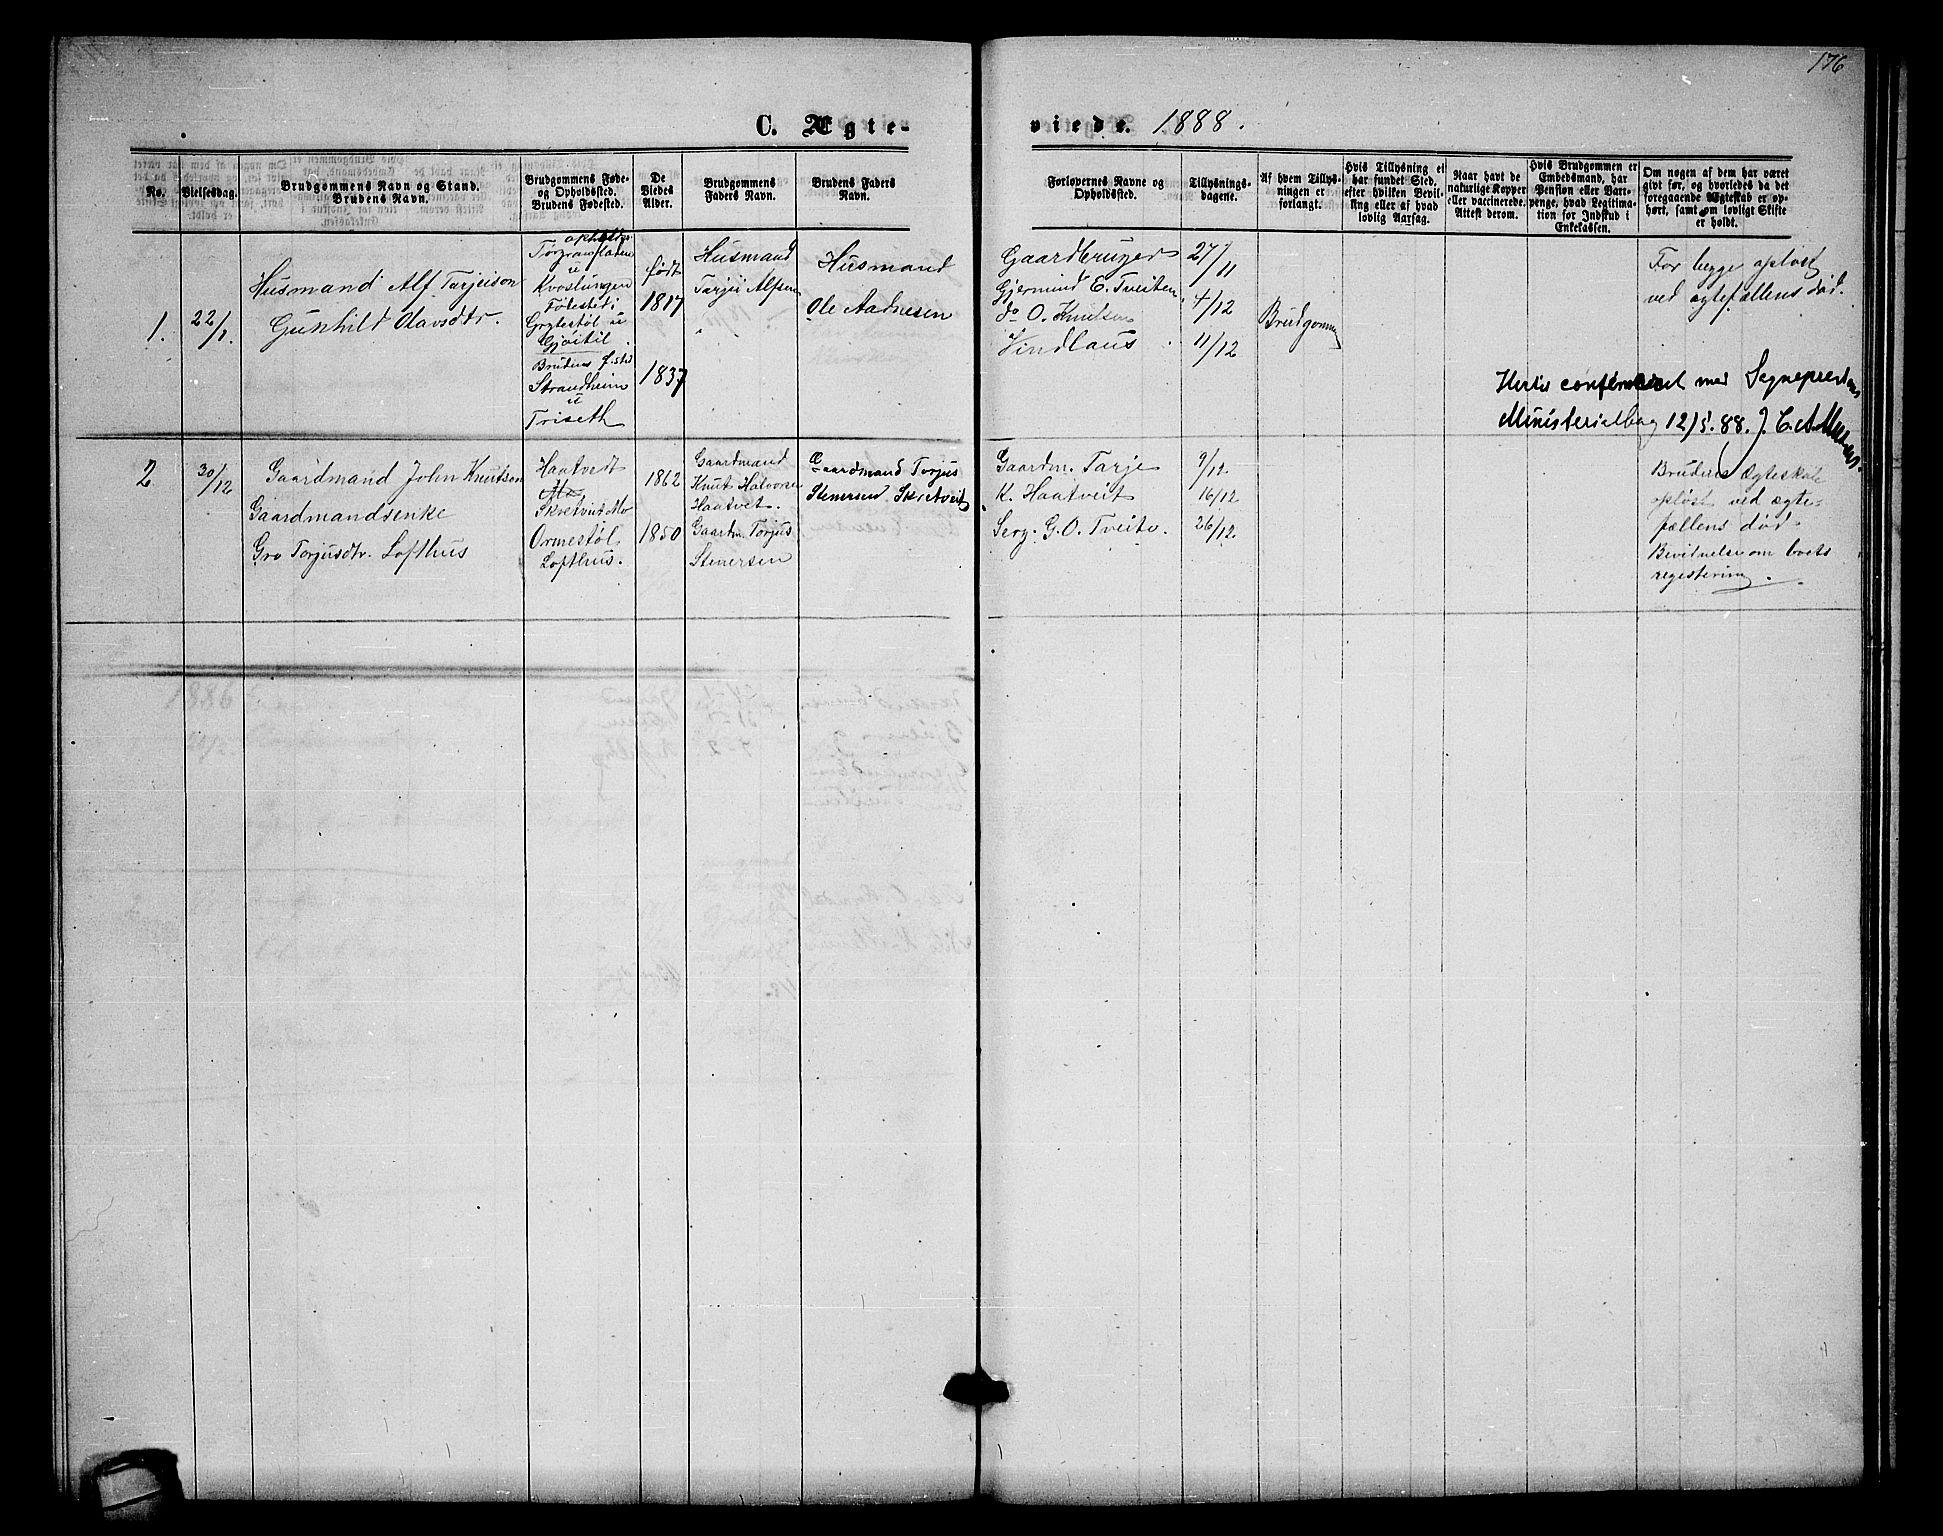 SAKO, Lårdal kirkebøker, G/Gb/L0002: Klokkerbok nr. II 2, 1865-1888, s. 176